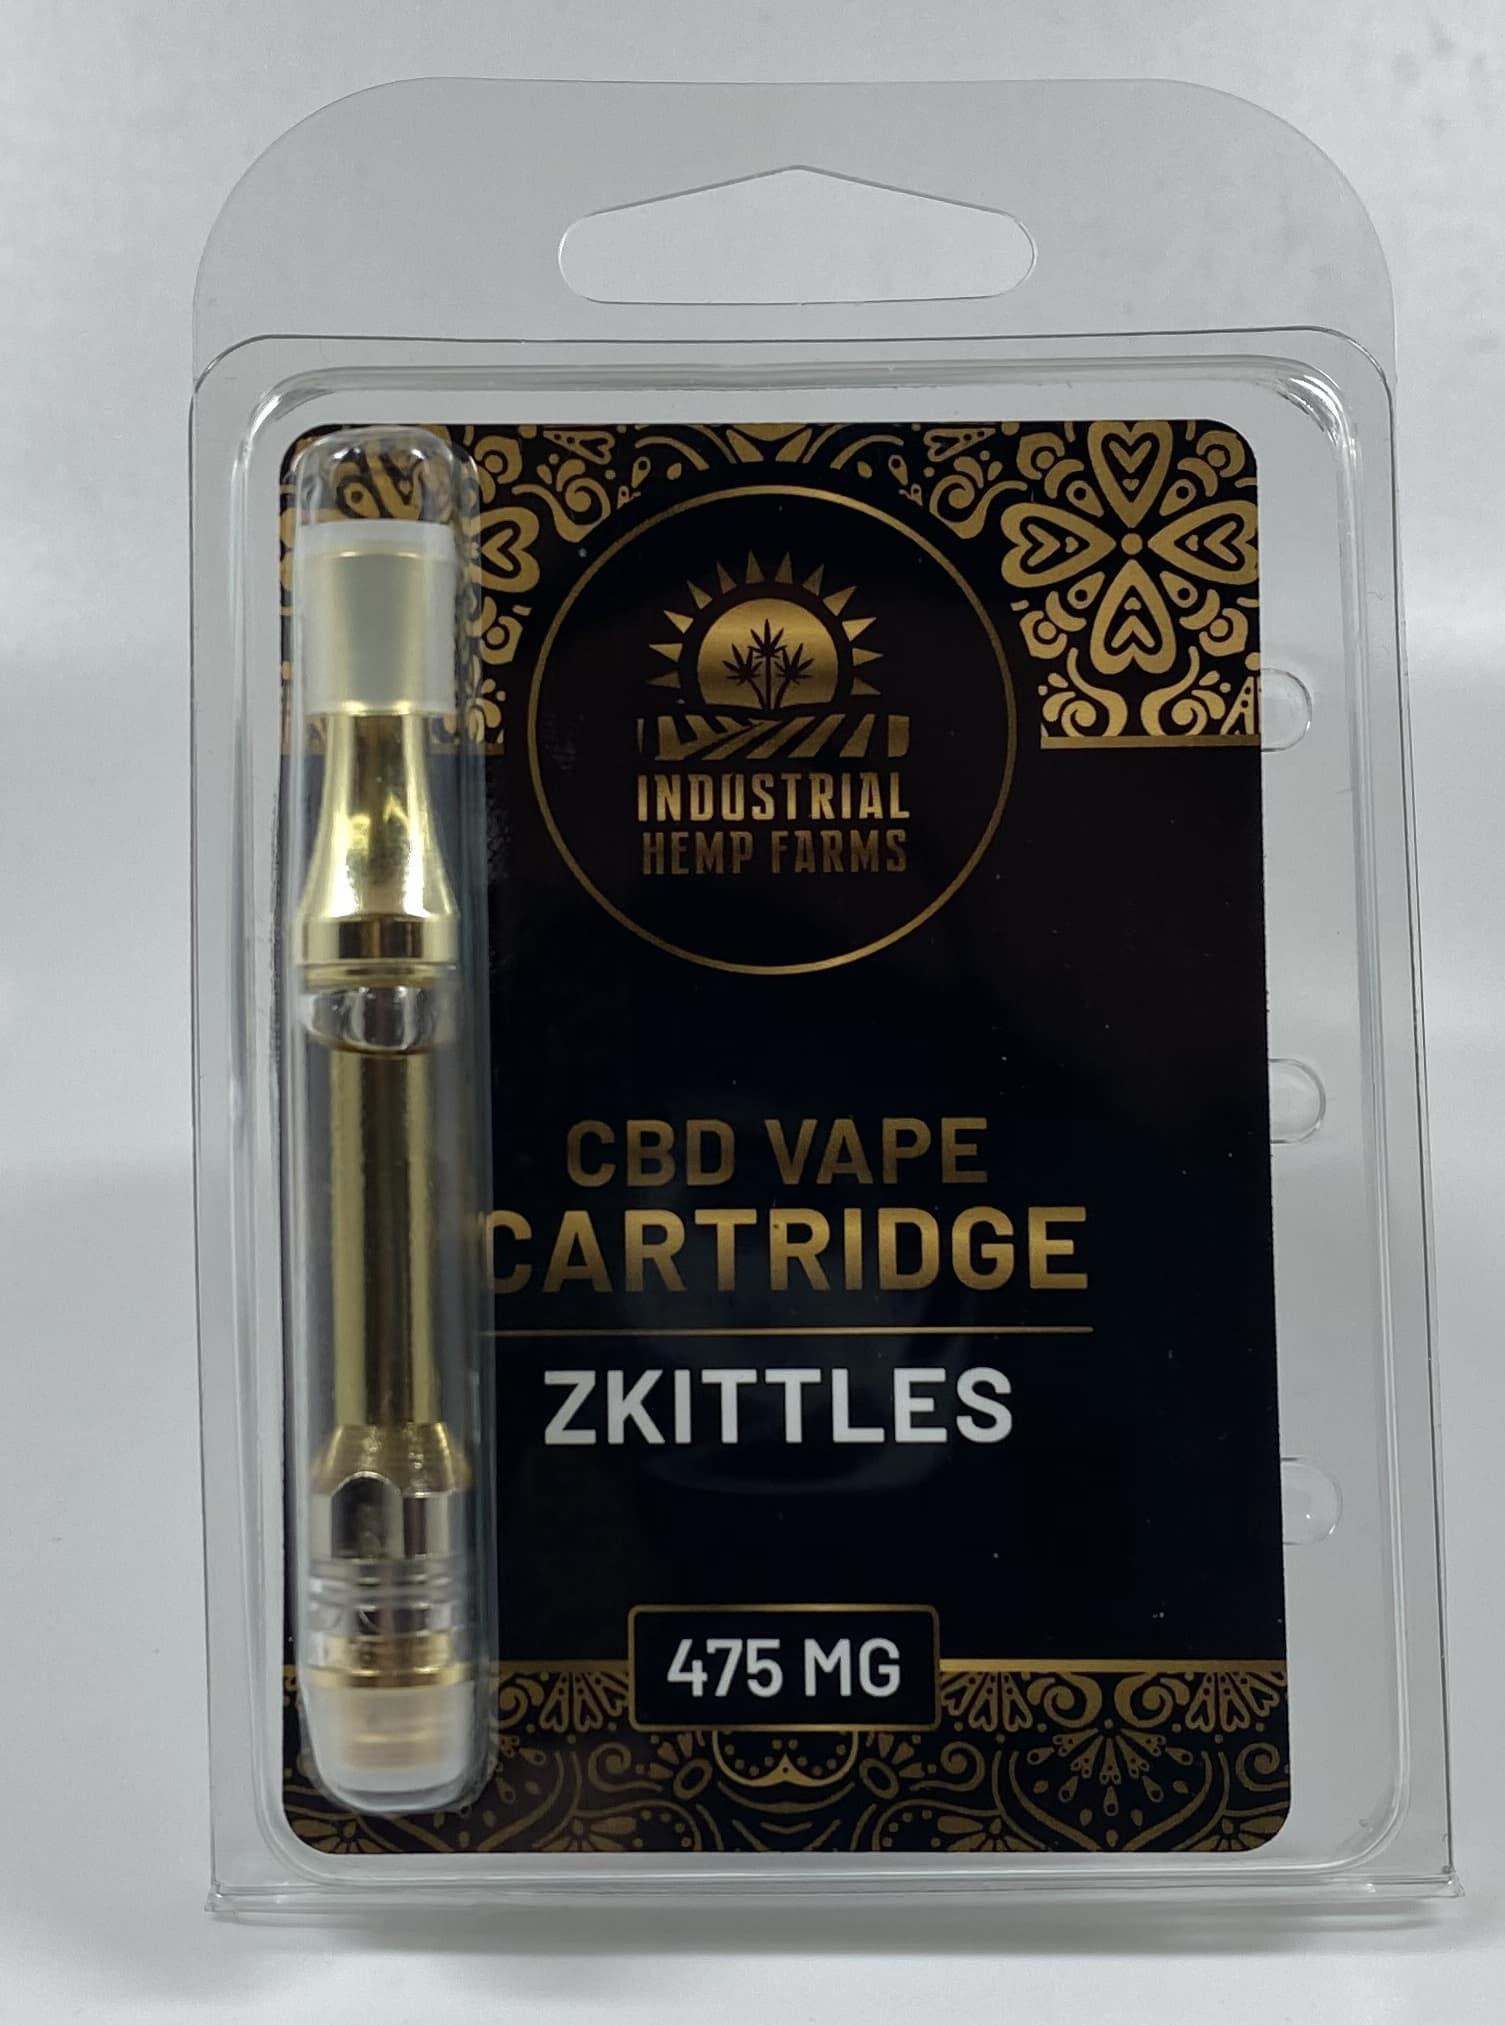 zkittles cbd vape pen cartridge for sale